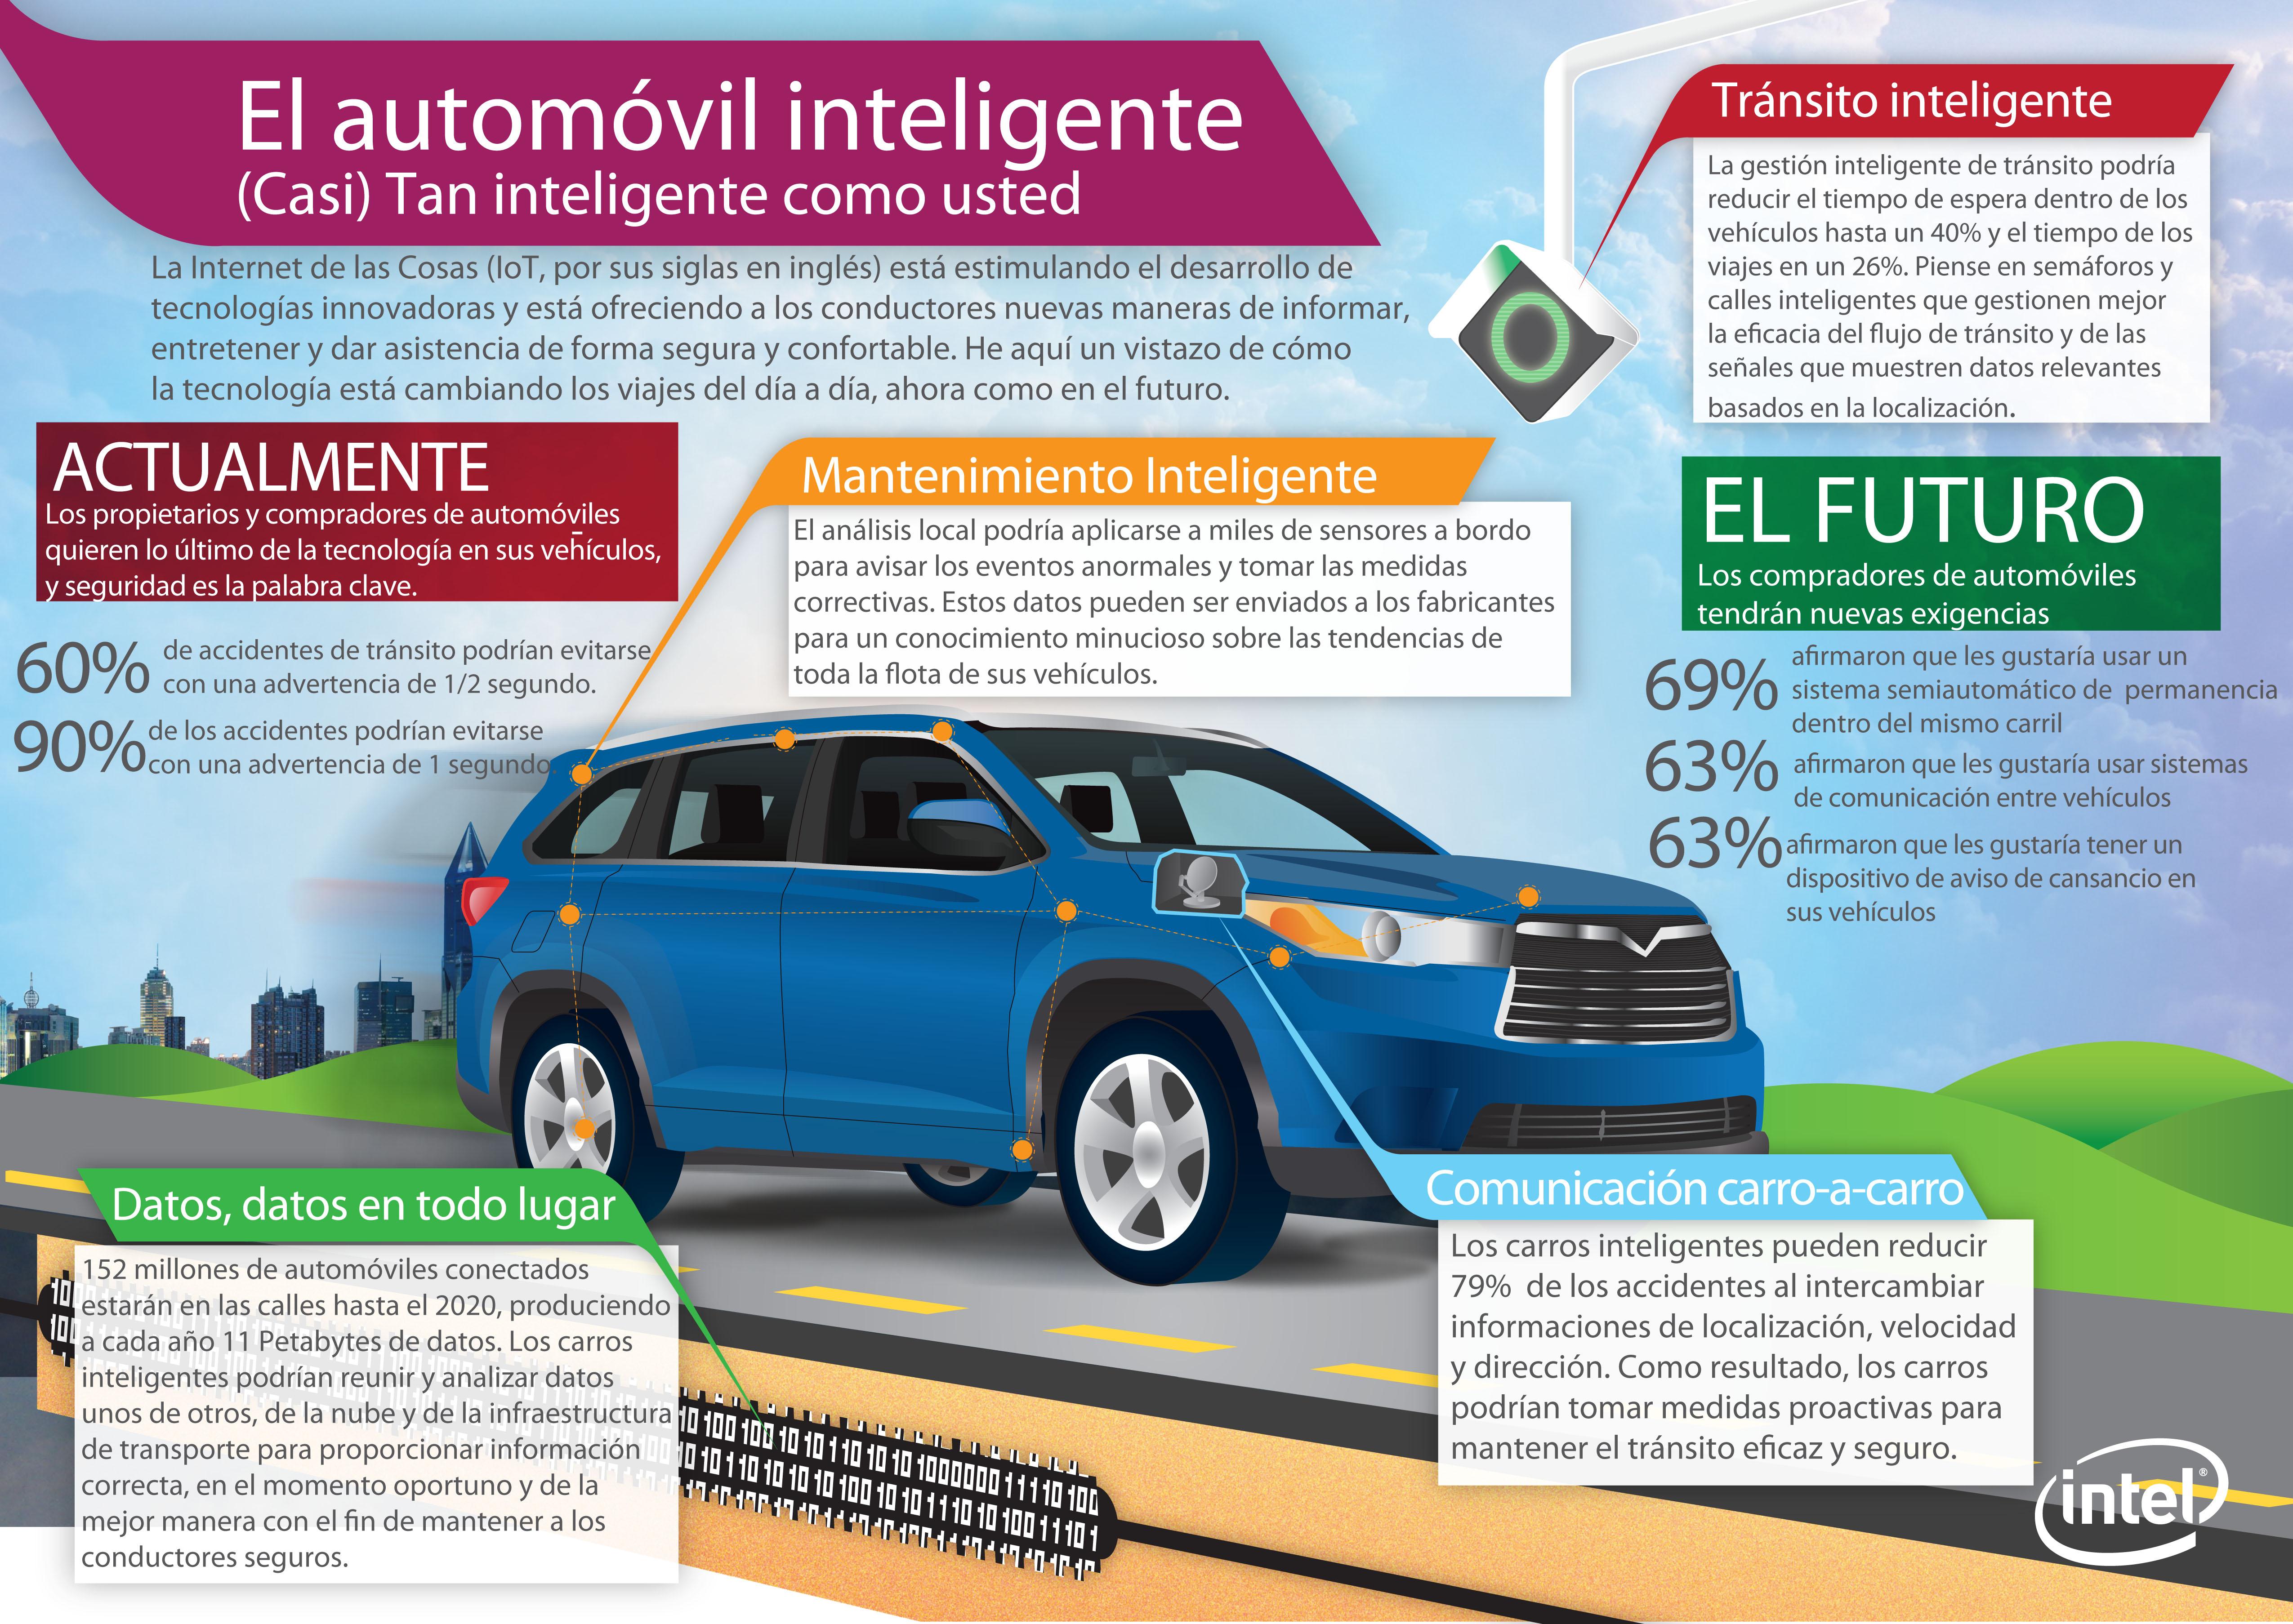 Intelligent_Car_noOutline_ESP.jpg